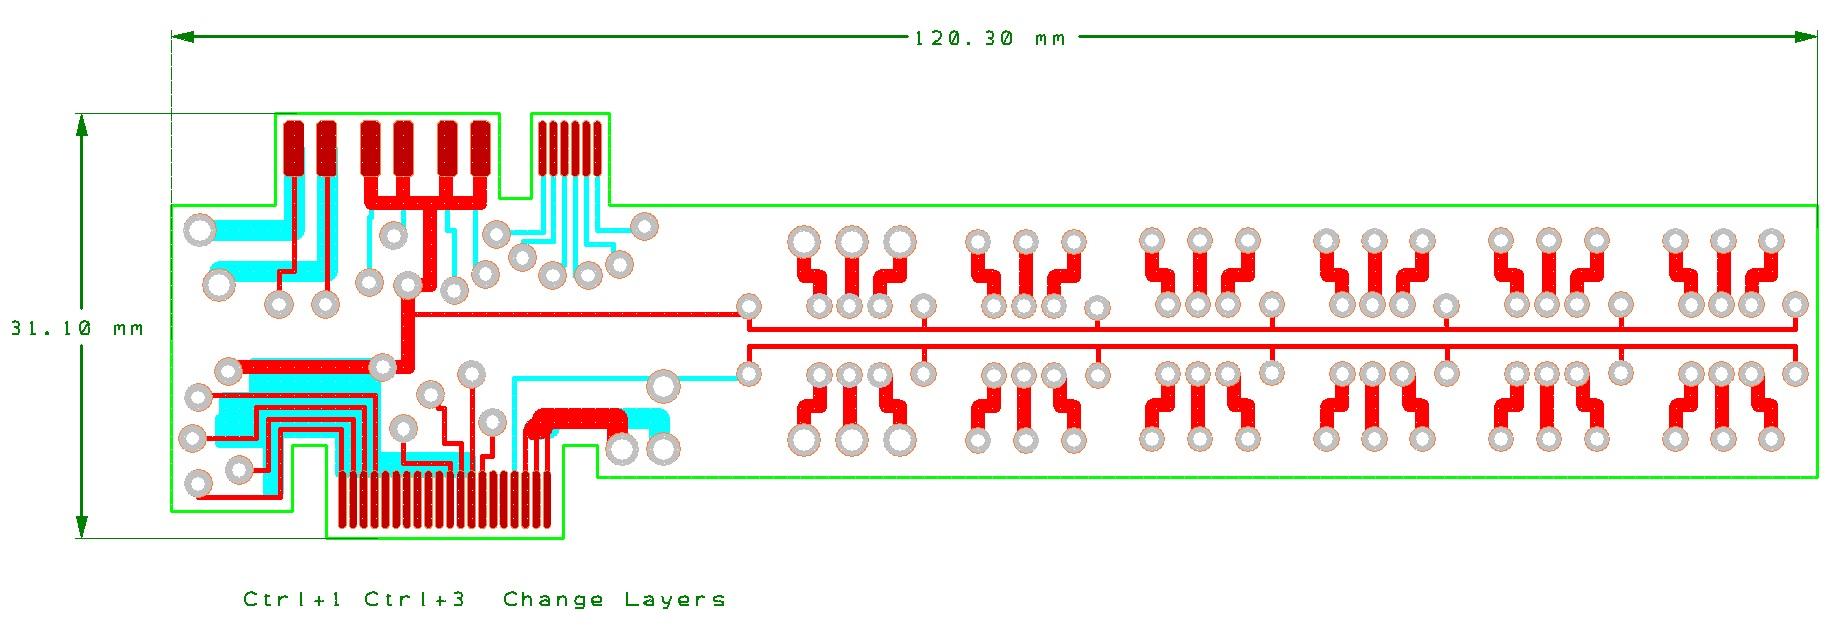 Sonar Sv Seeker Wiring Diagrams Sonarhub Connectors V4